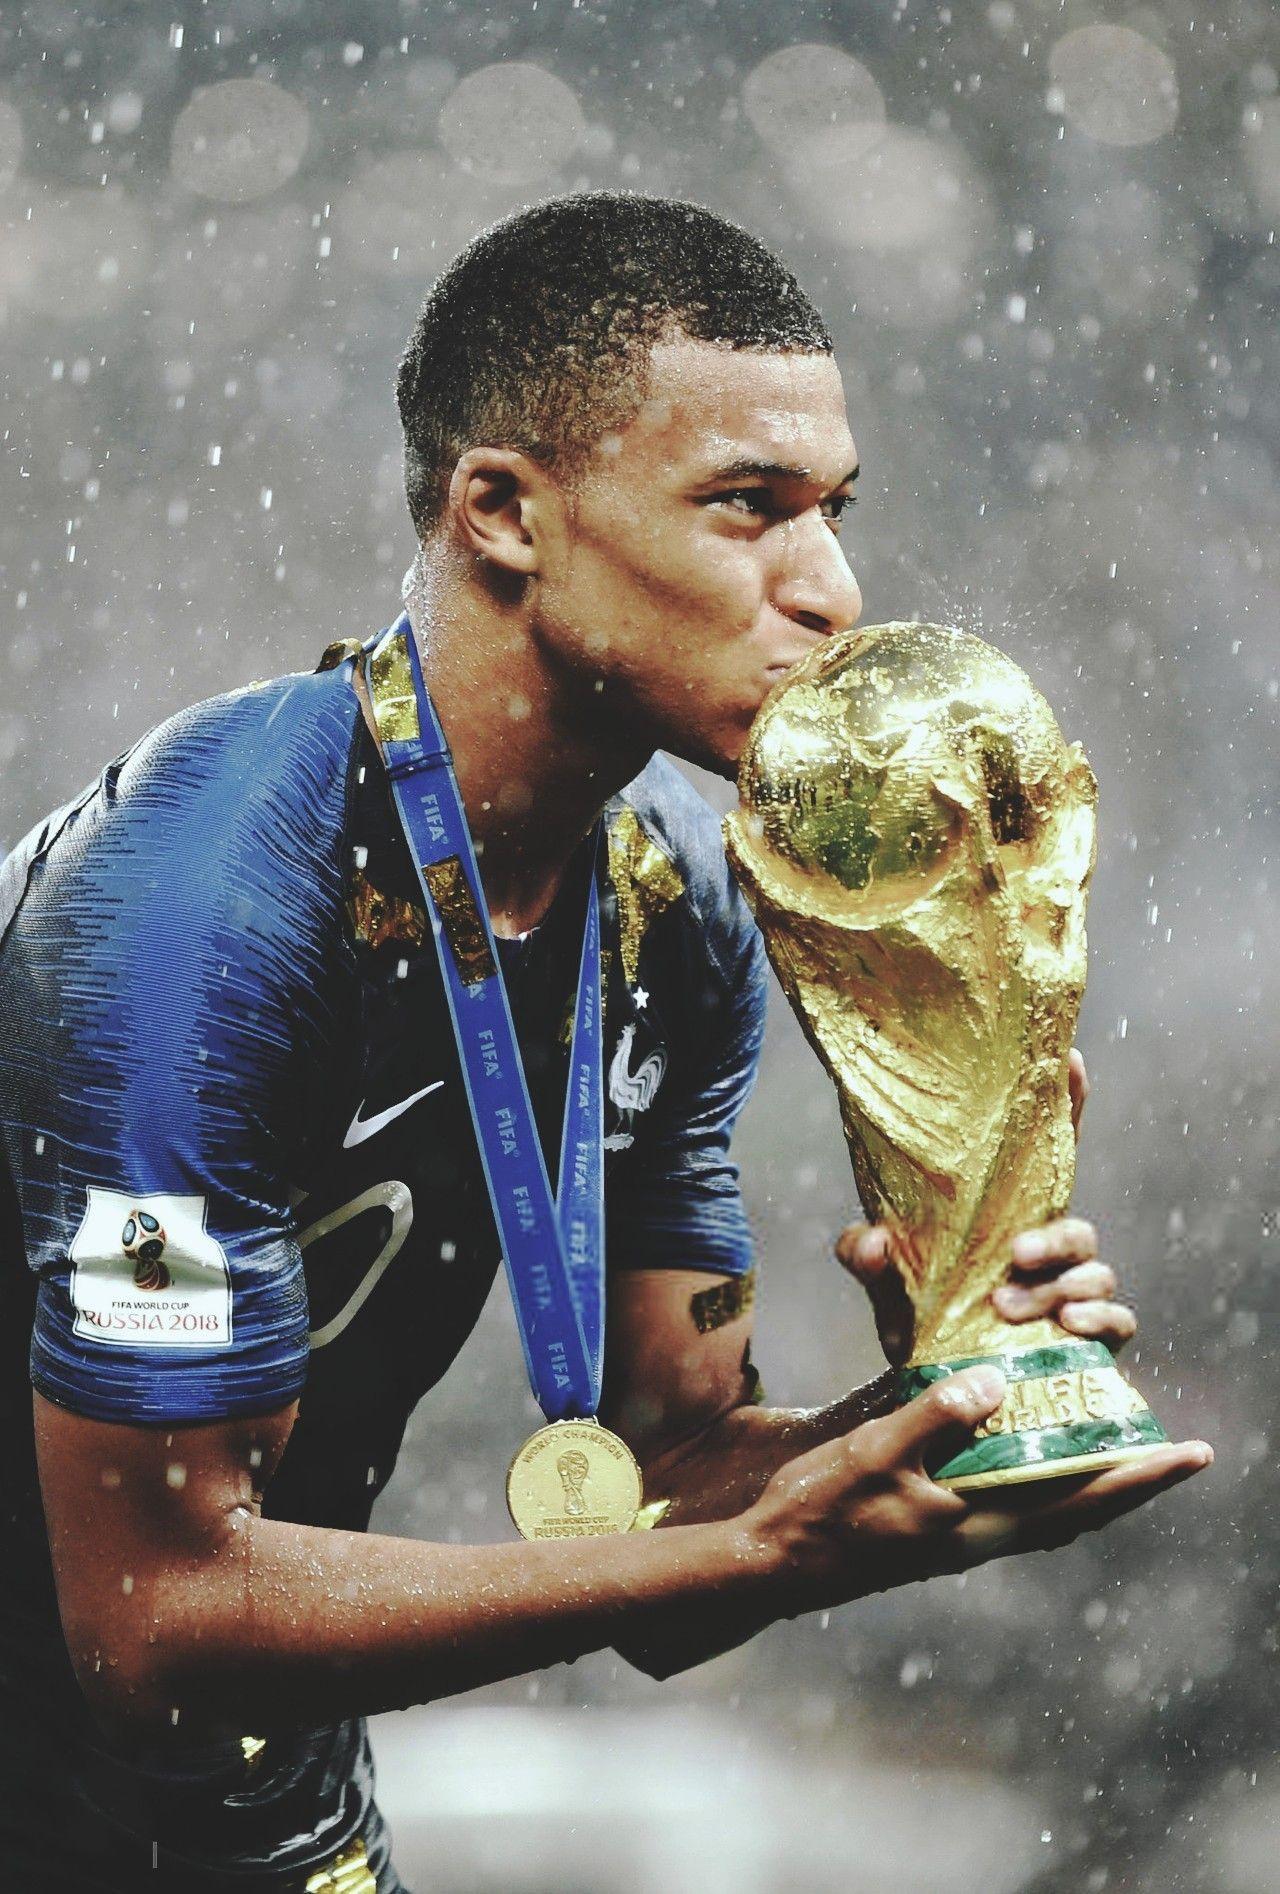 Kylian Mbappe Boy Wonder World Cup Winner At 19 Years Old Football Russia 2018 Foot Futbol Football E Kylian Mbappe World Cup Kilian Mbappe